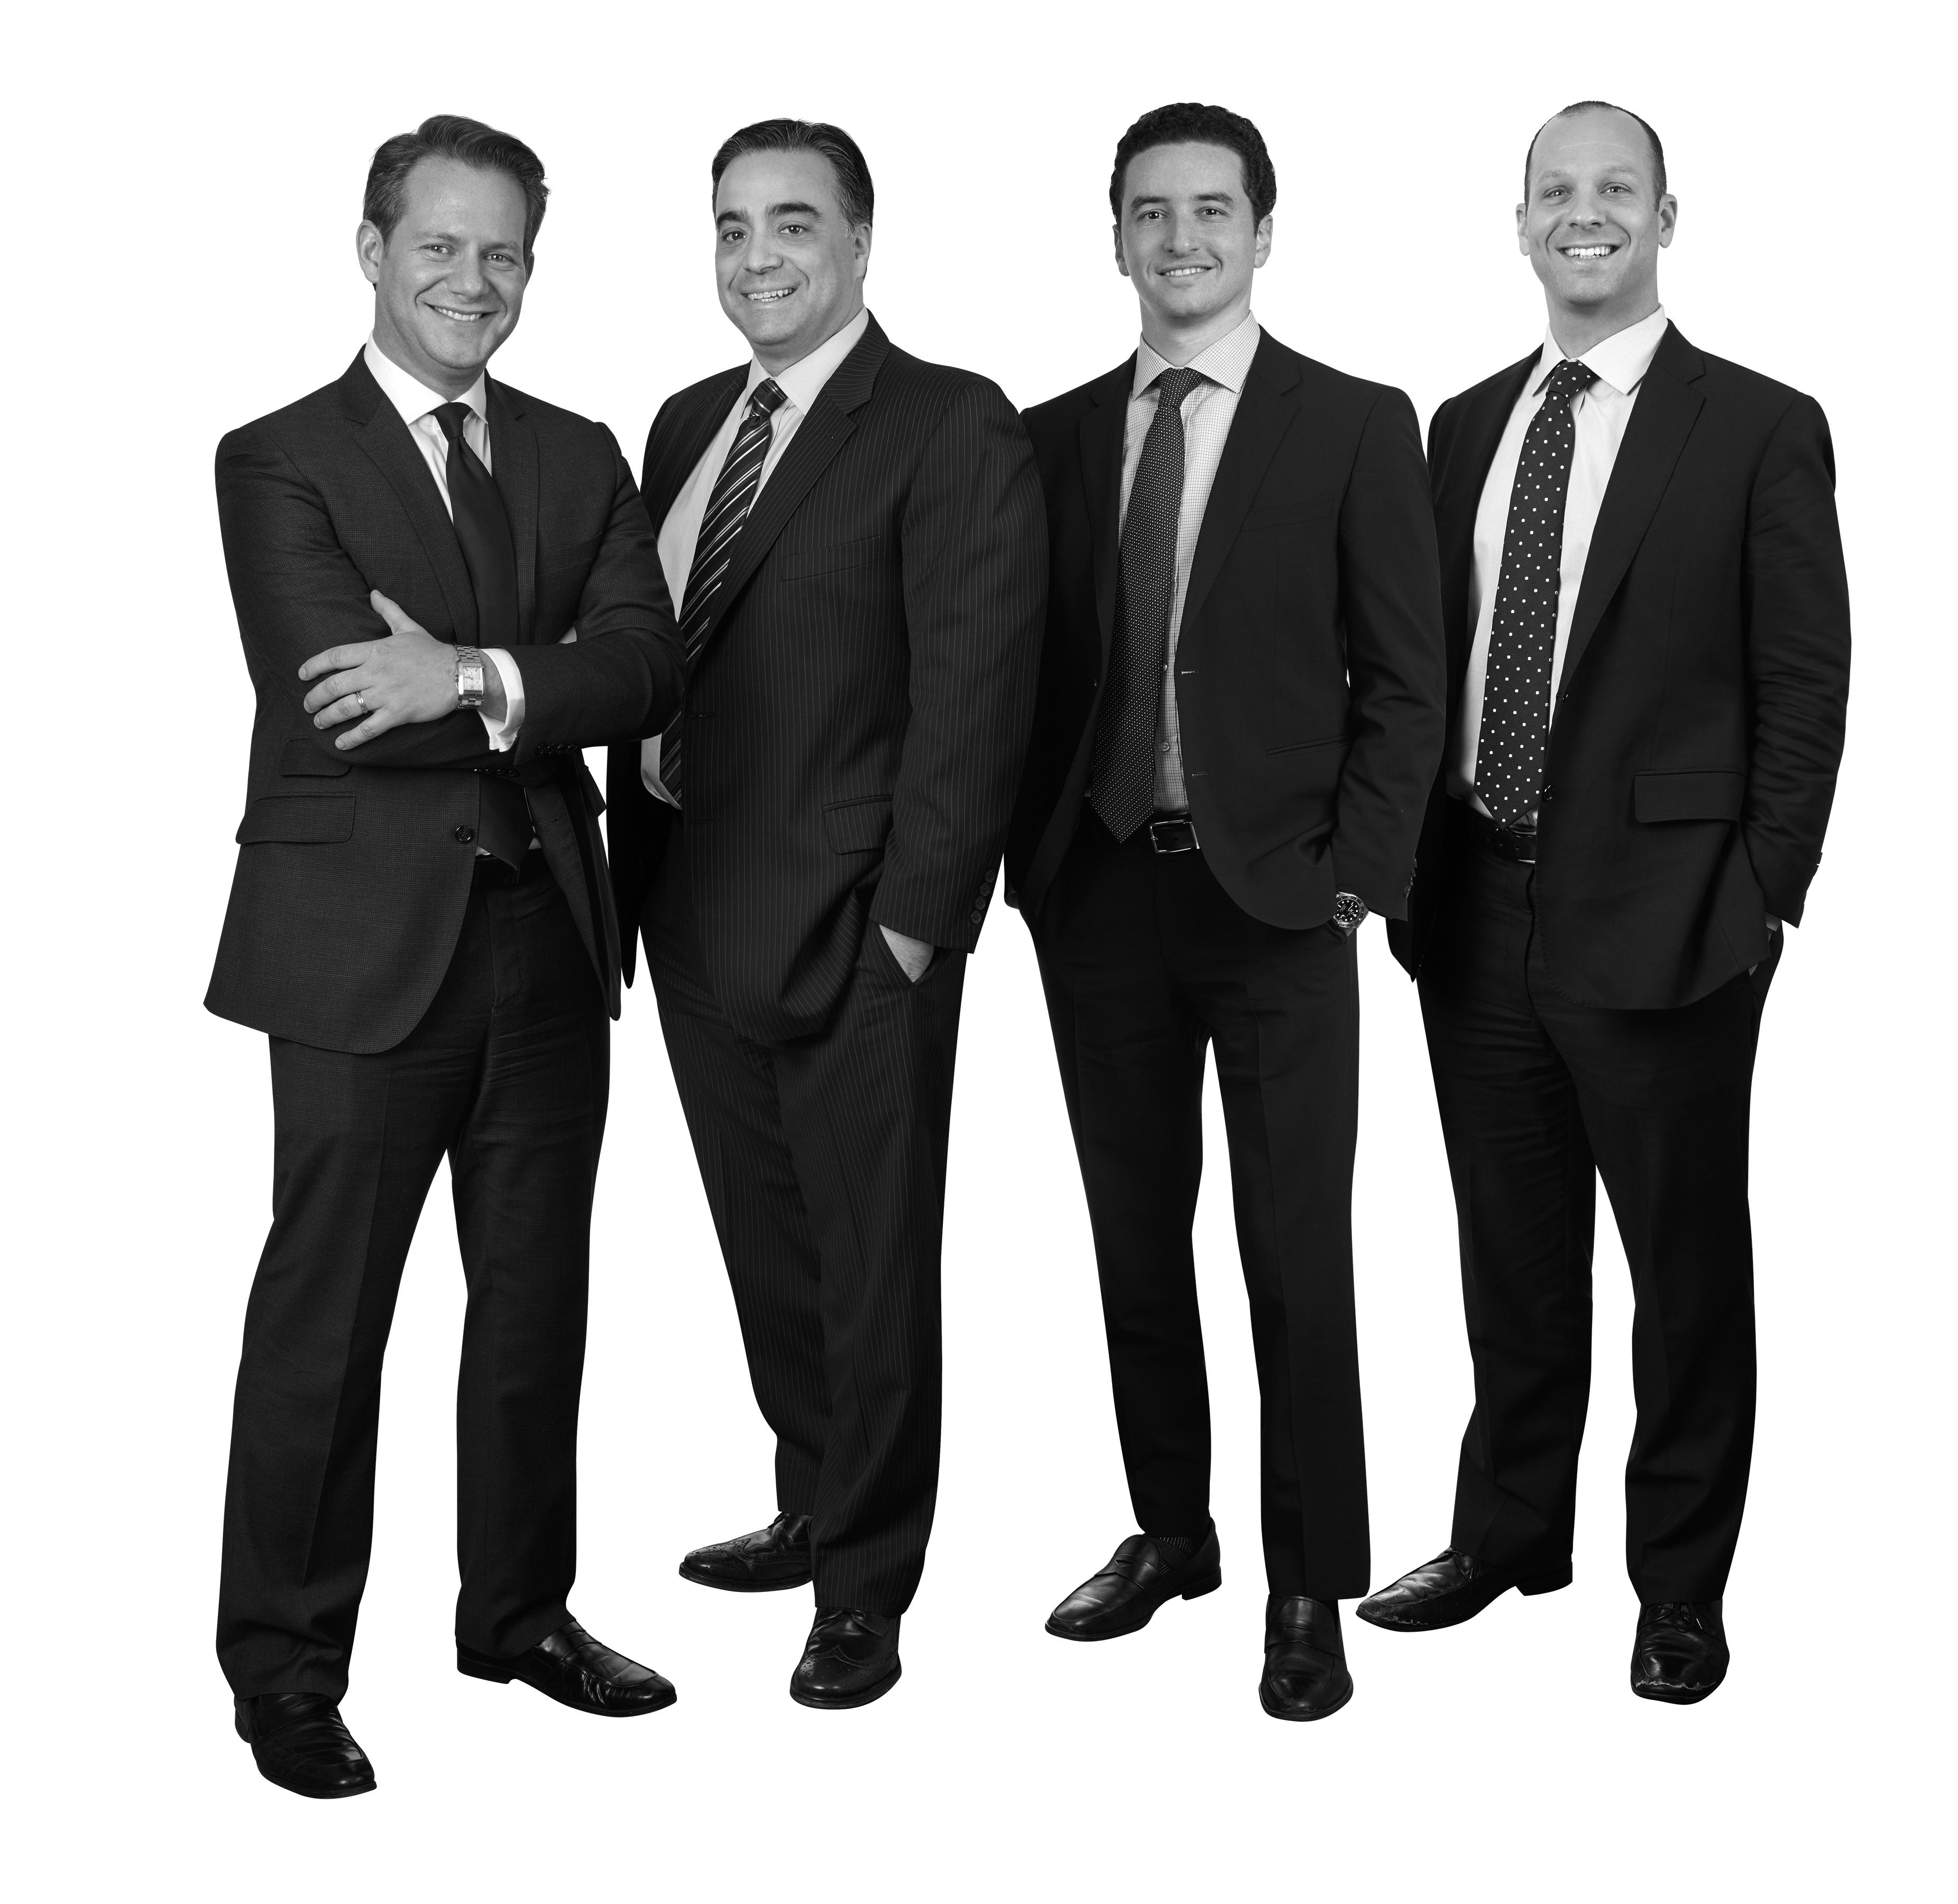 left to right; Cory M. Baker, Michael DeVirgilio, Zachary Sigel and Samuel Porat